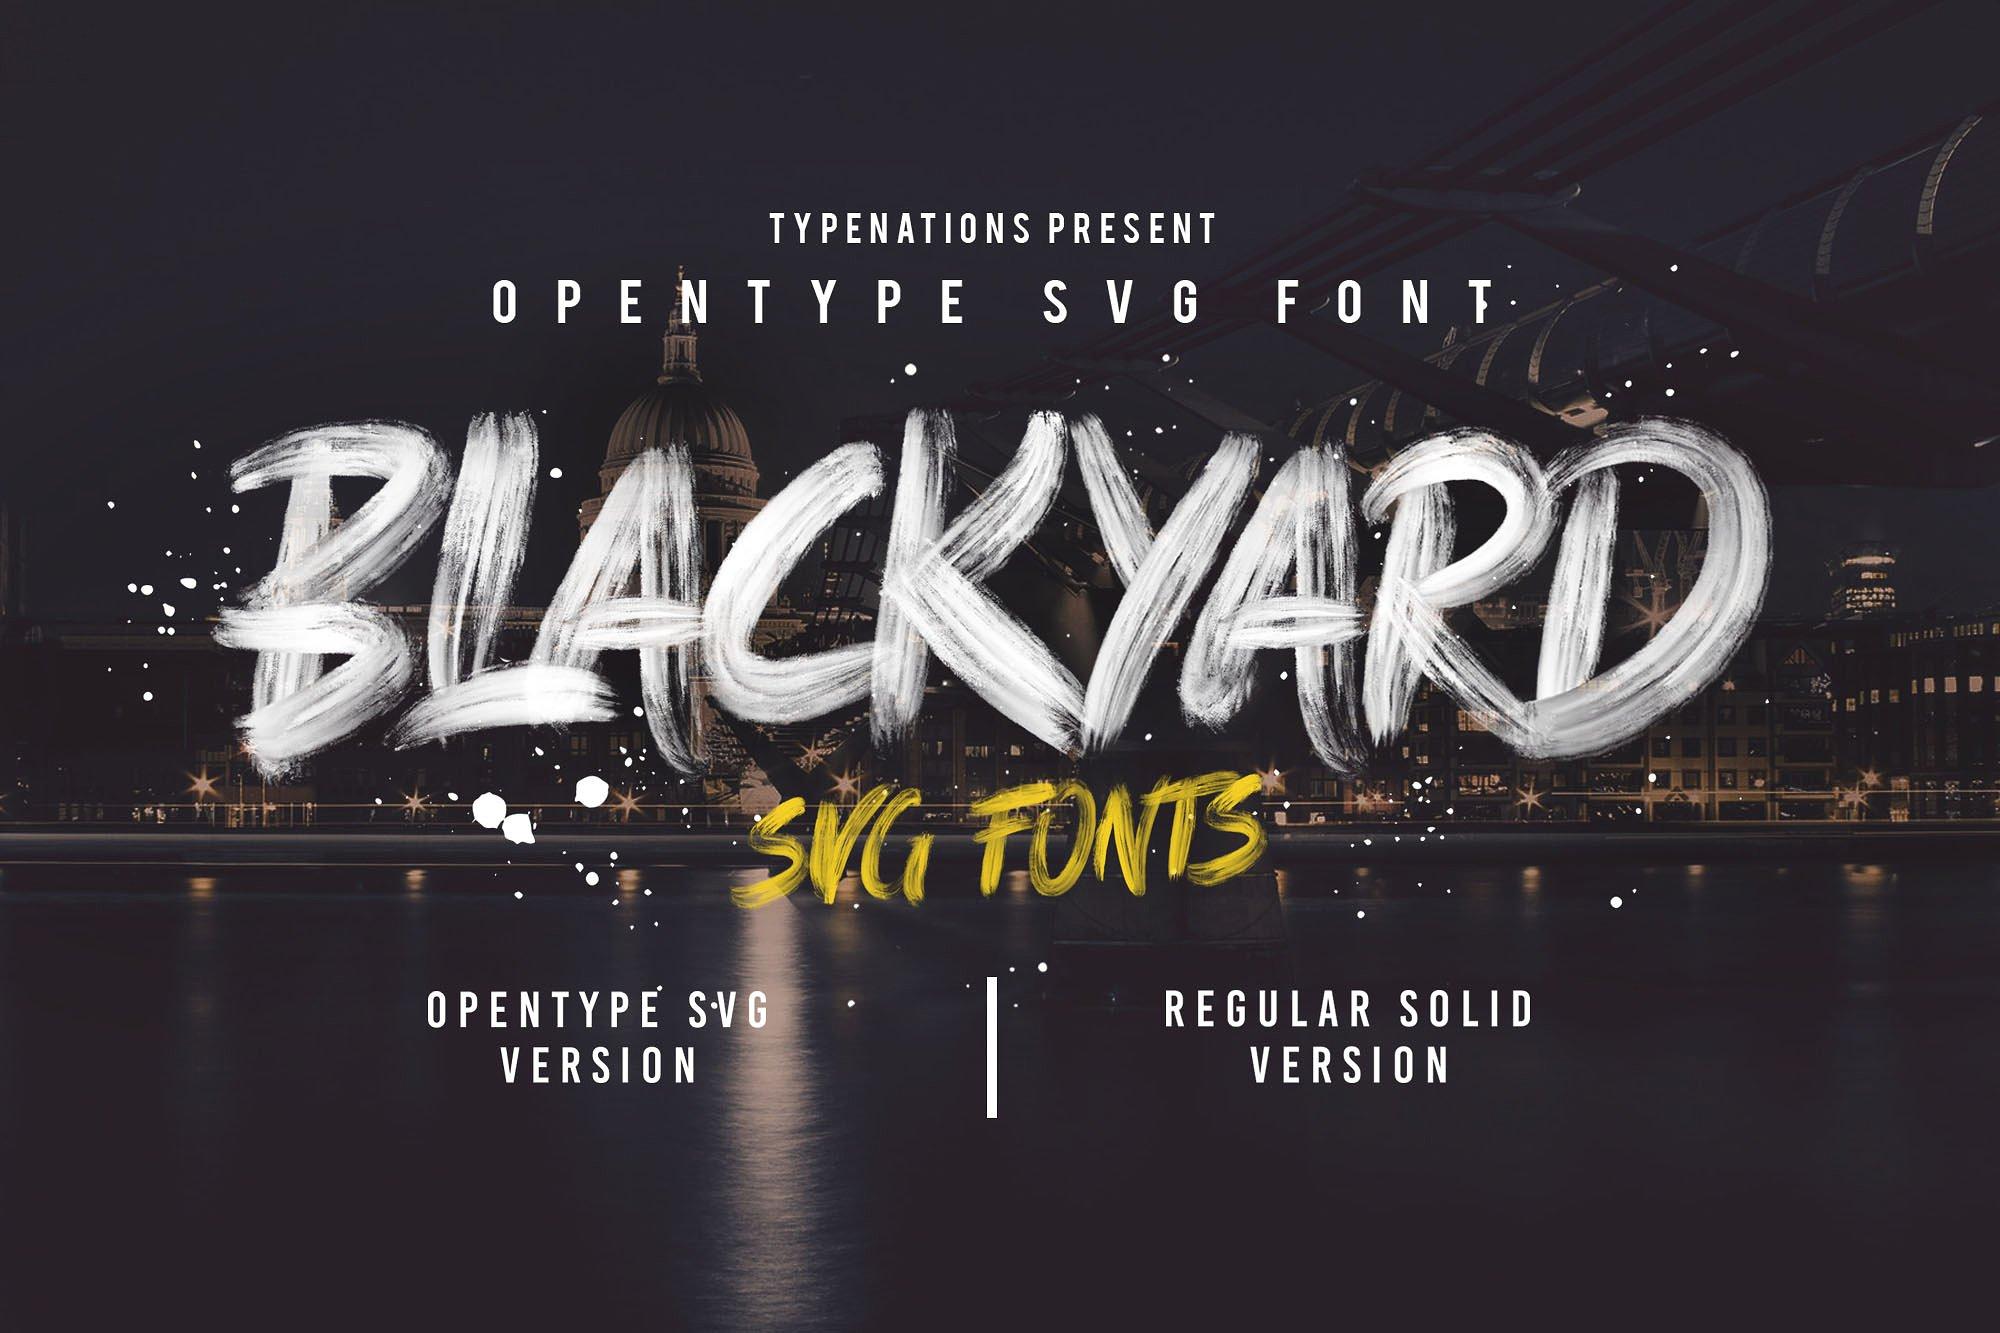 Blackyard OpenType - SVG Font example image 1